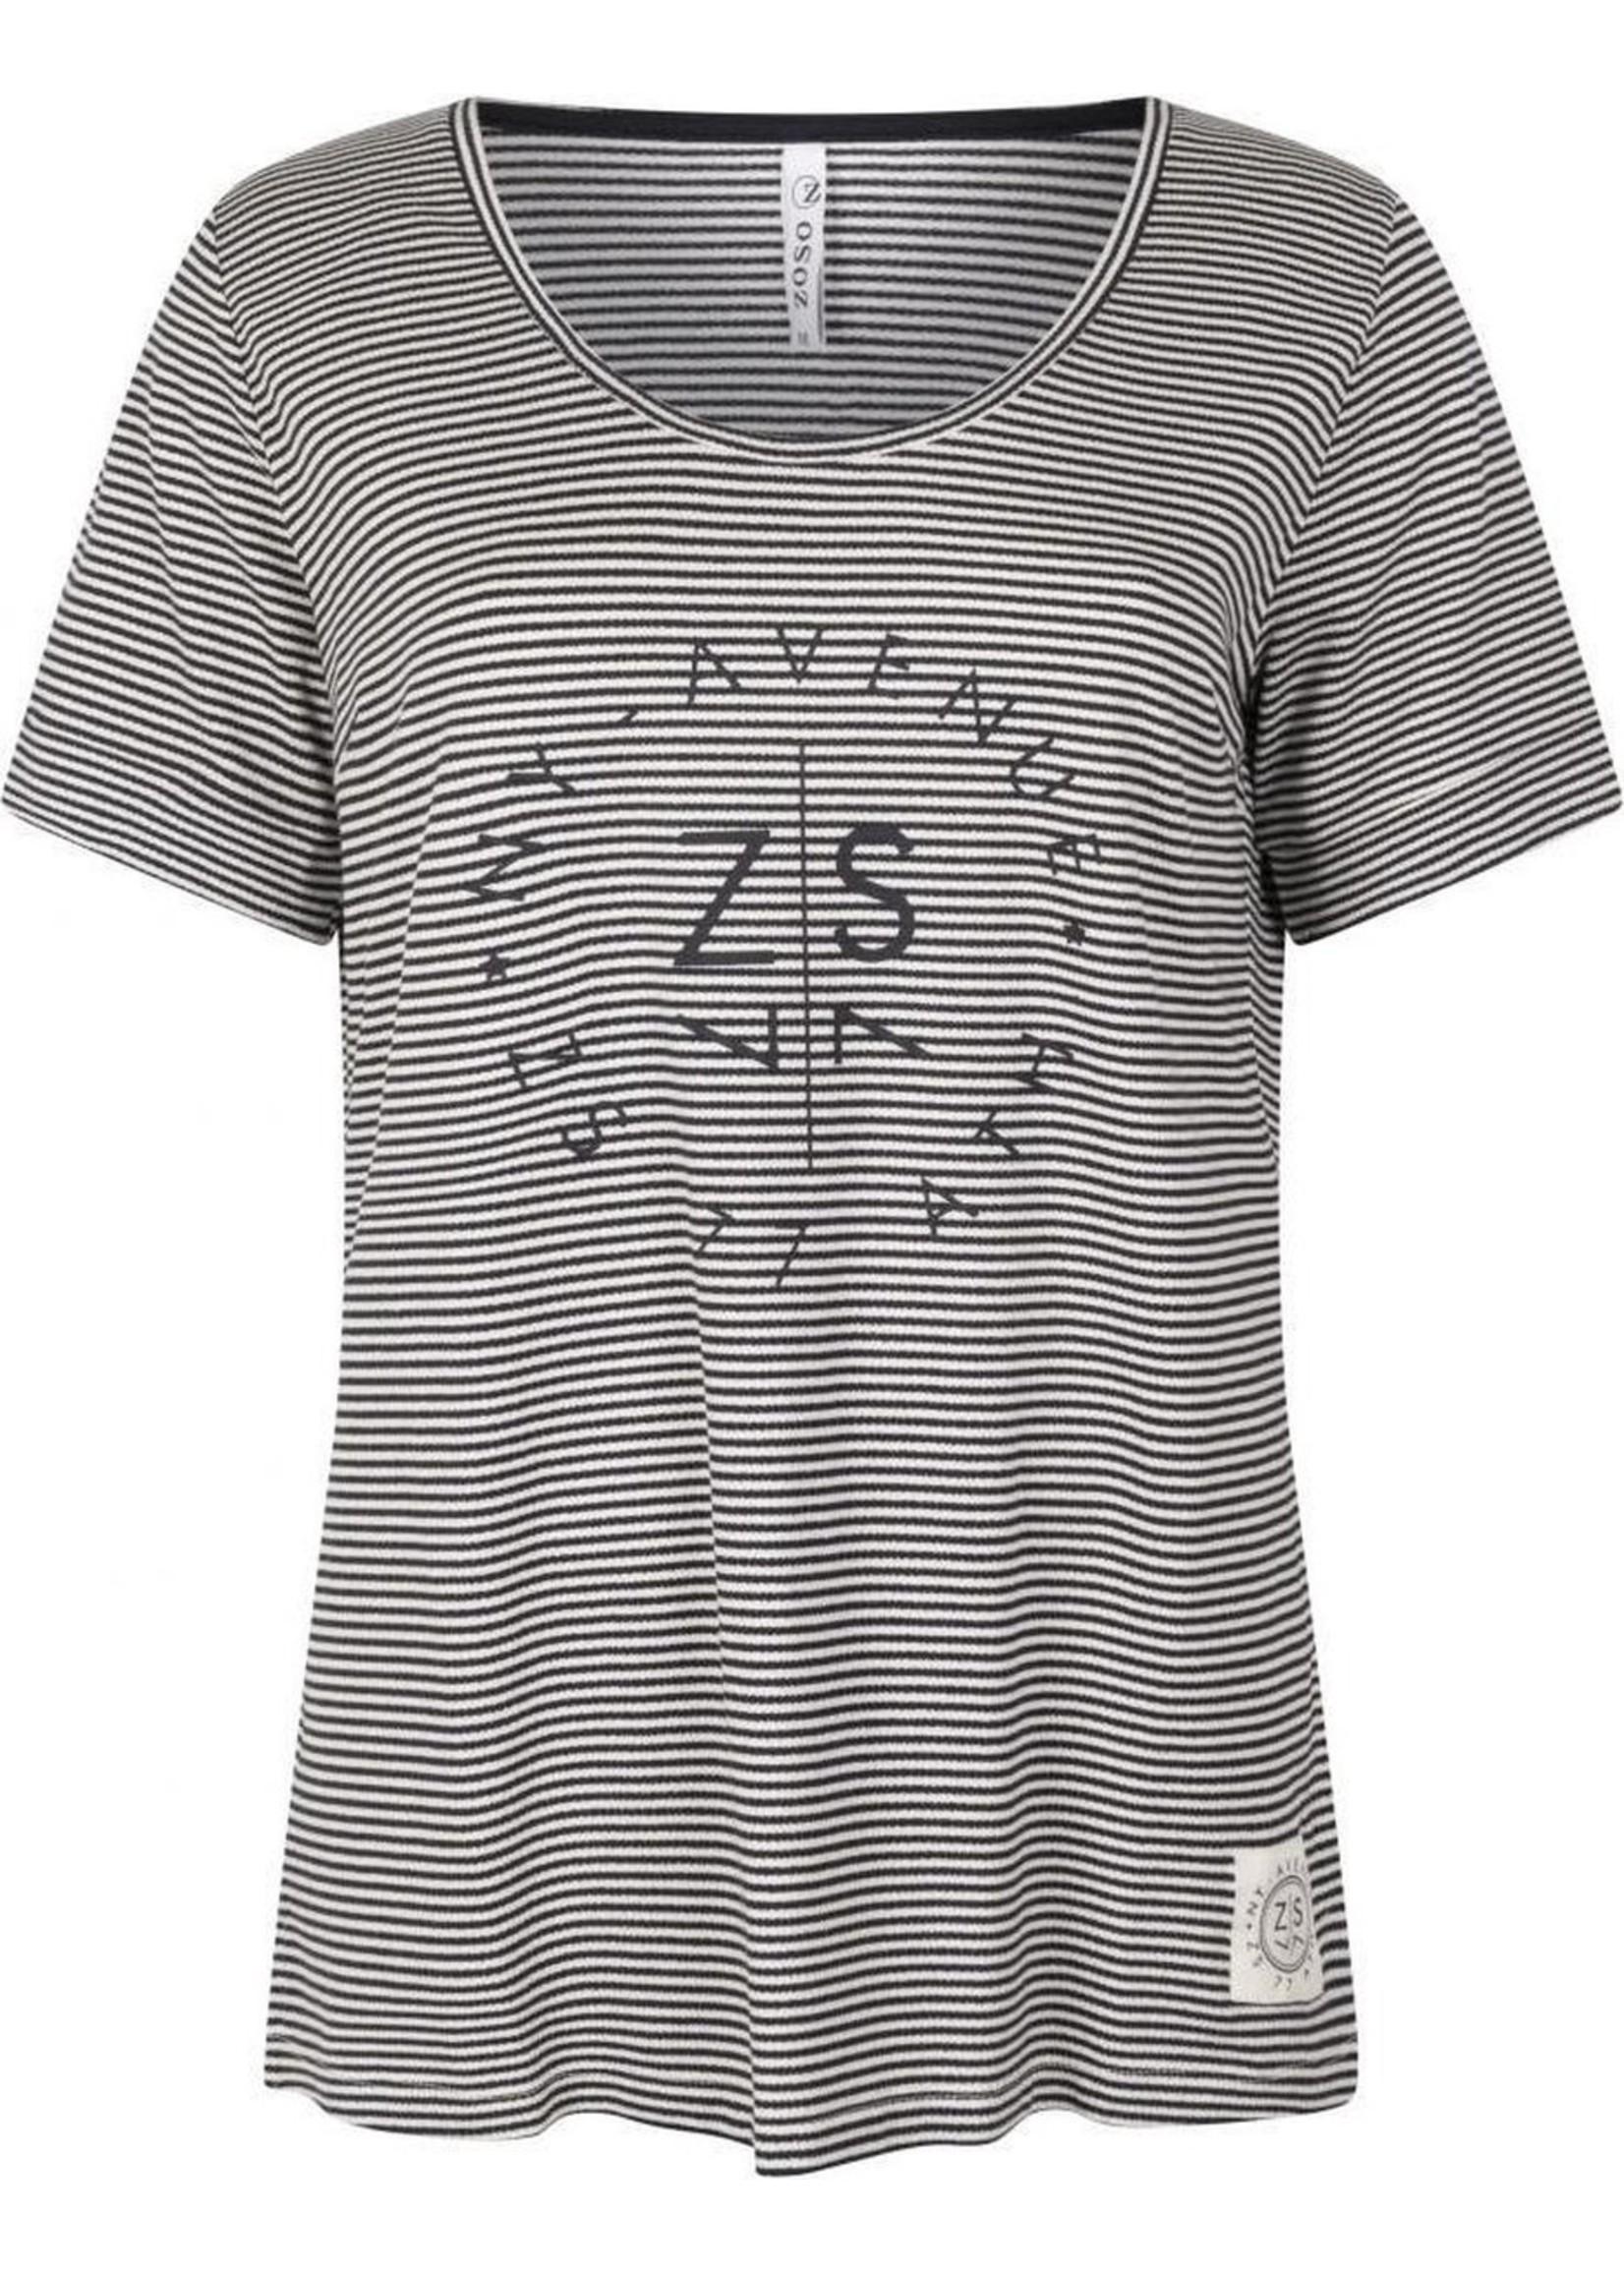 Zoso t-shirt Fabienne L blauw